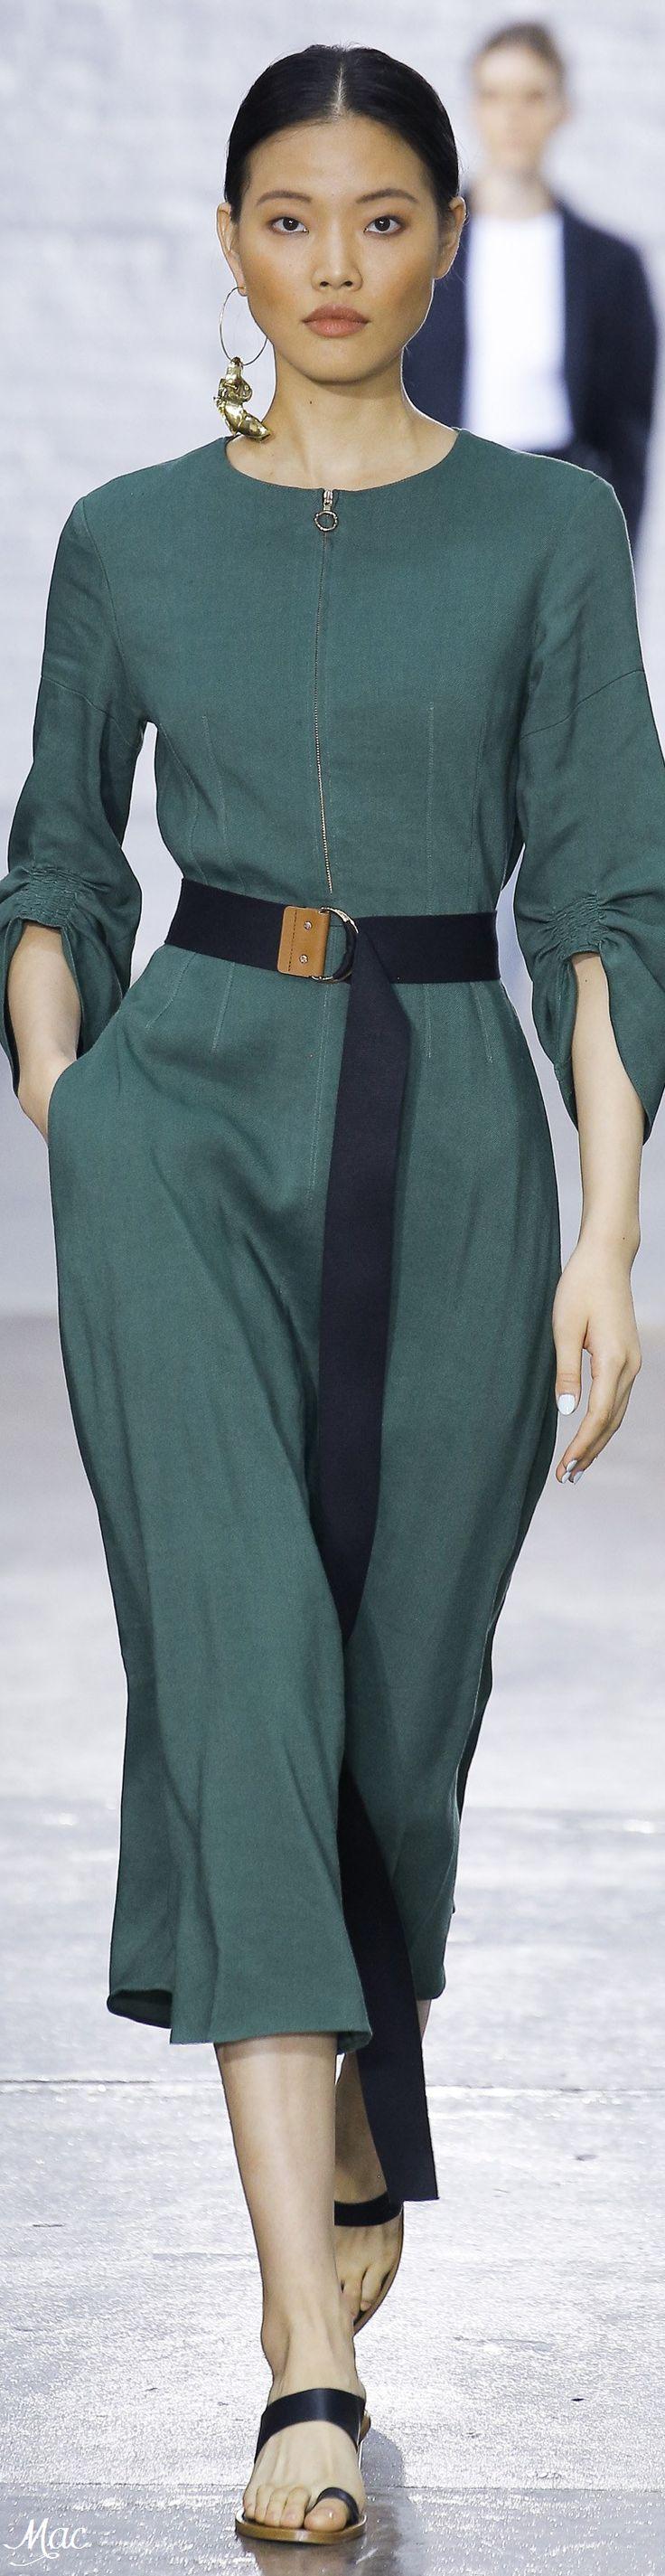 Spring 2017 Ready-to-Wear Tibi